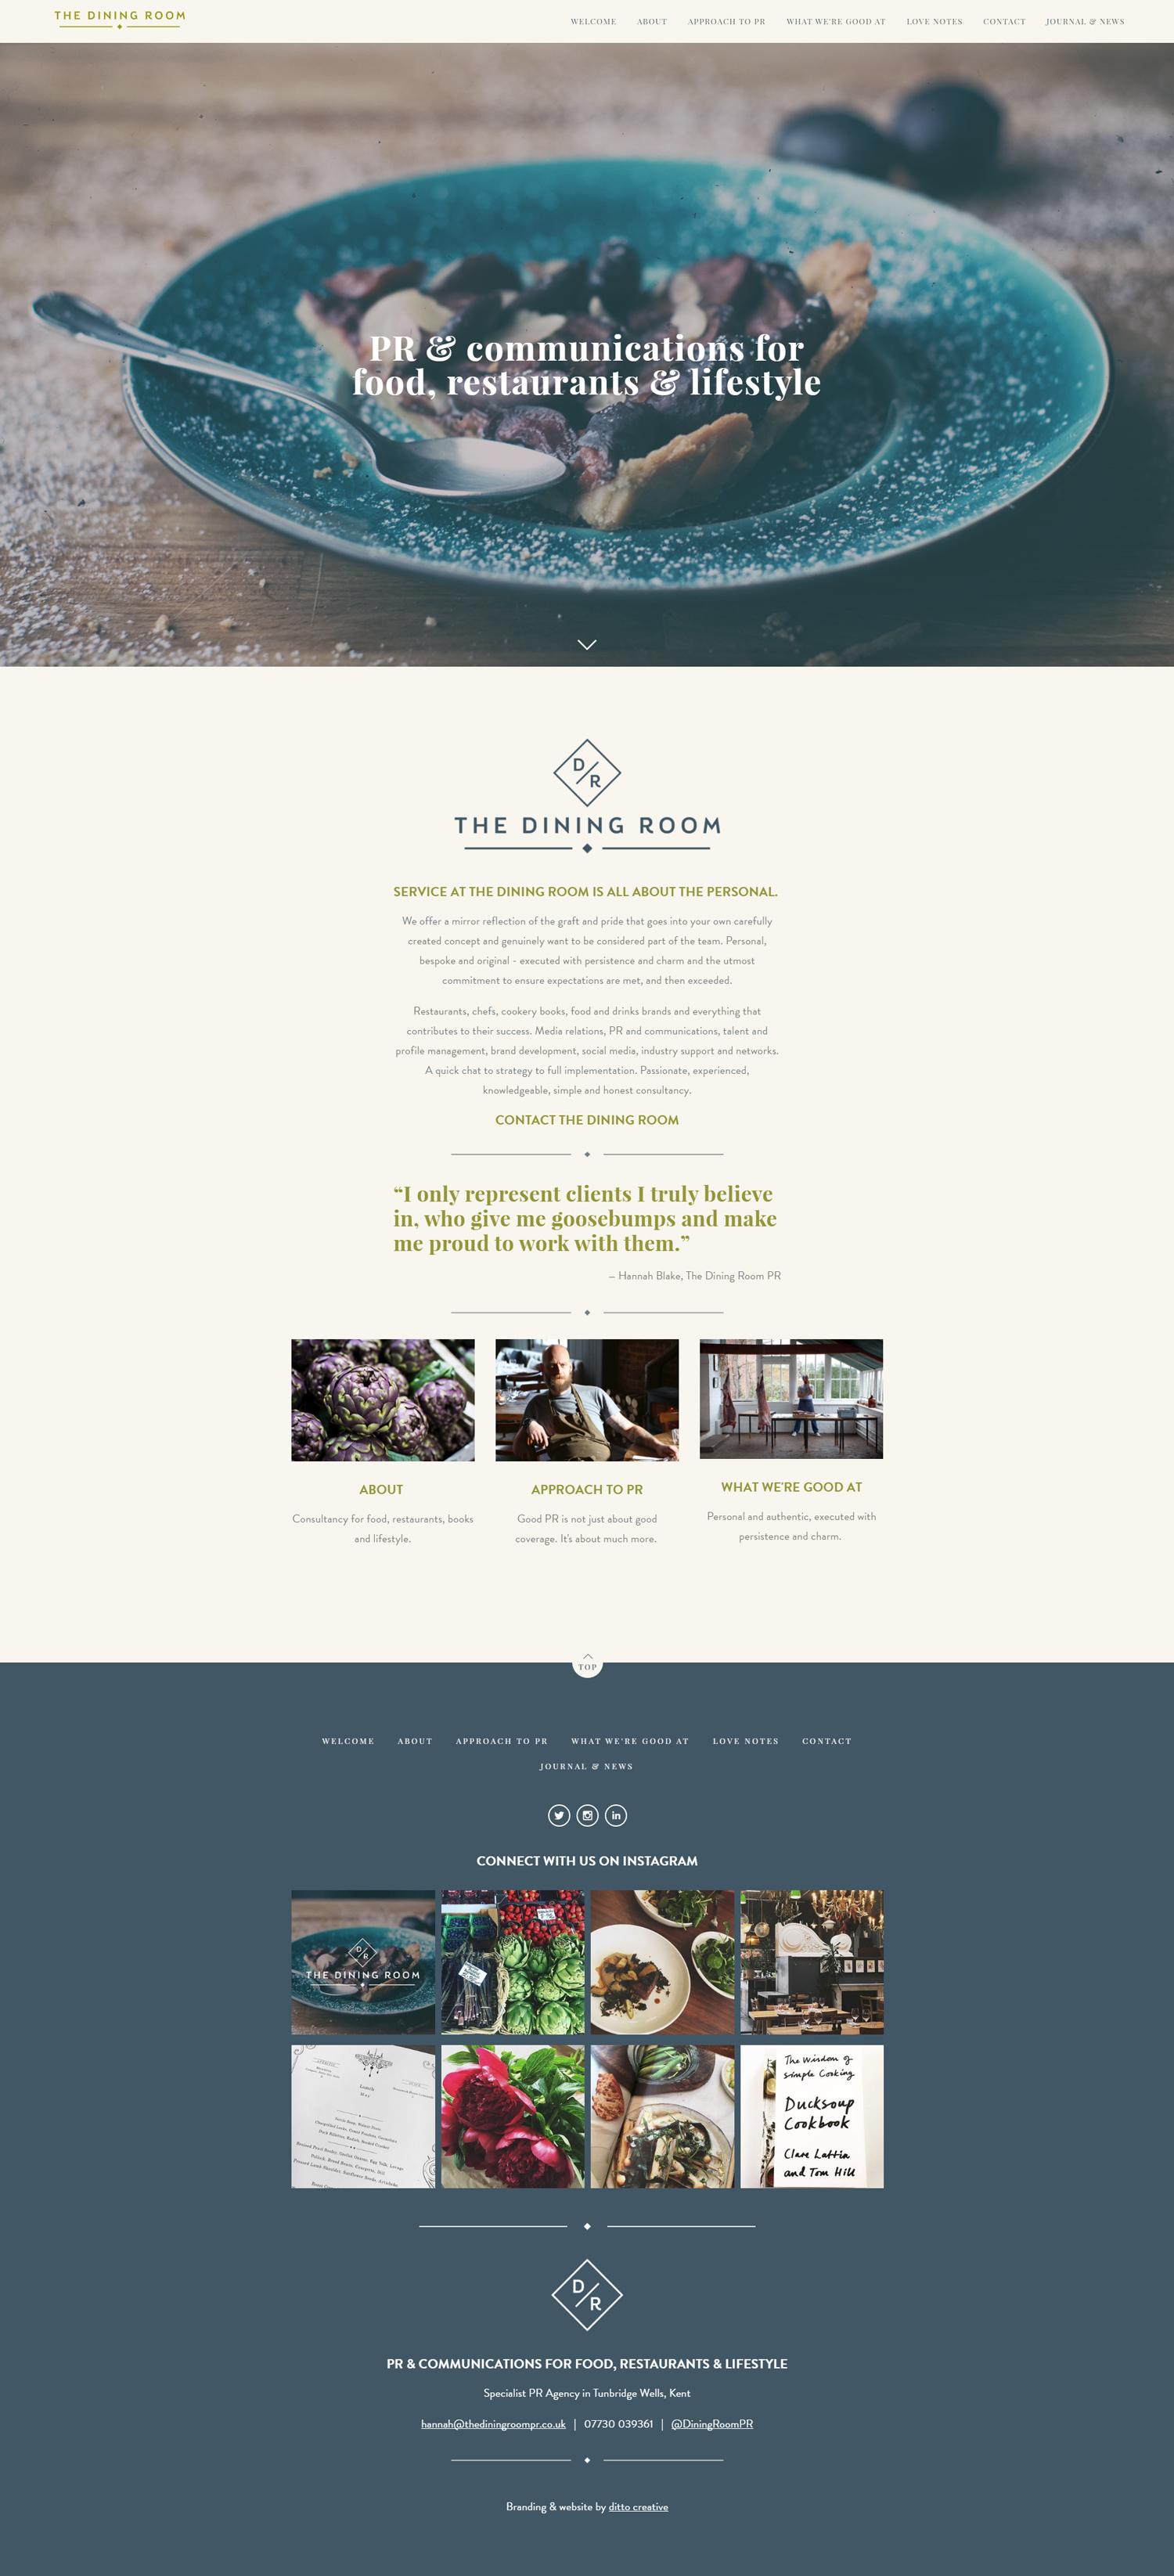 The Dining Room PR website design by Ditto creative, branding agency kent, squarespace website designer